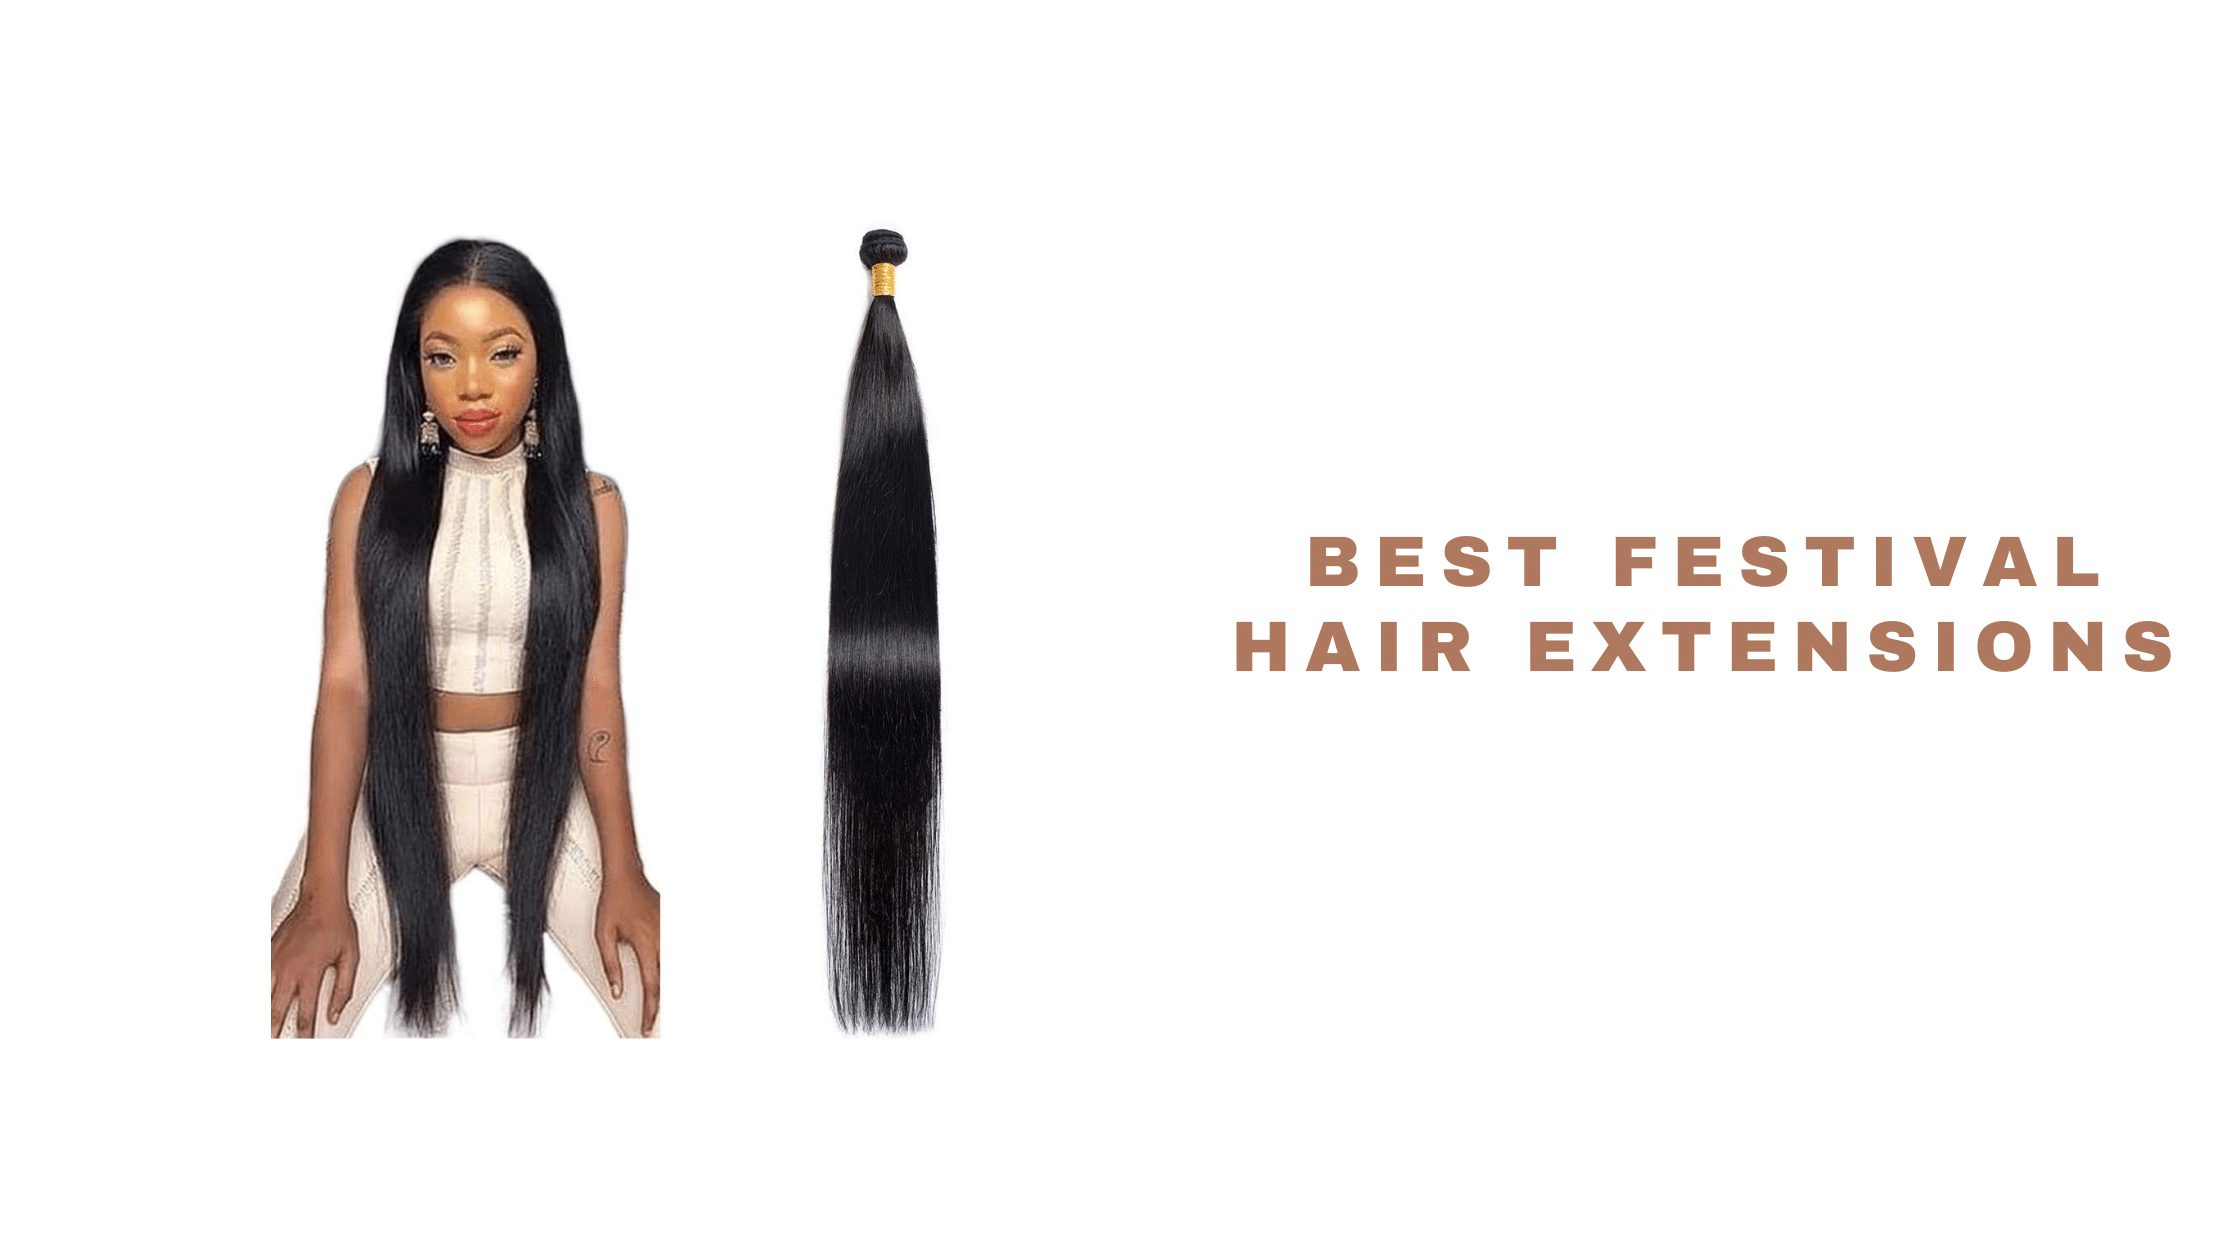 Best Festival Hair Extensions 2021